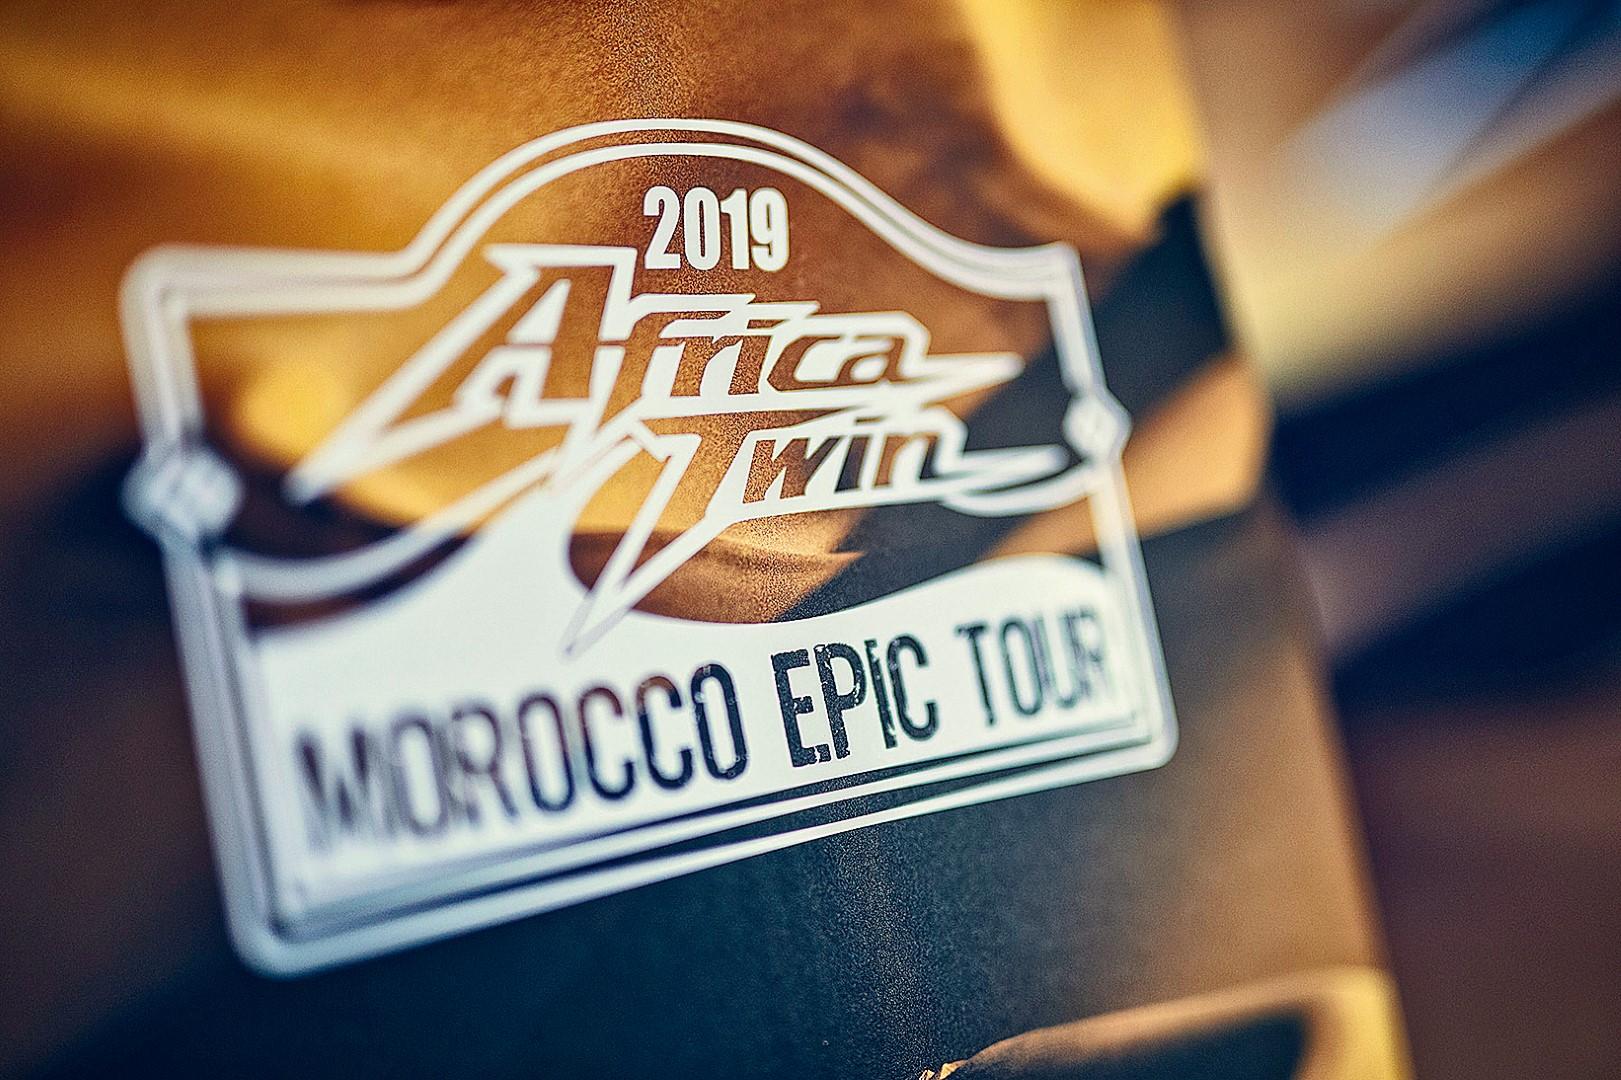 Honda Morocco Epic Tour 2019